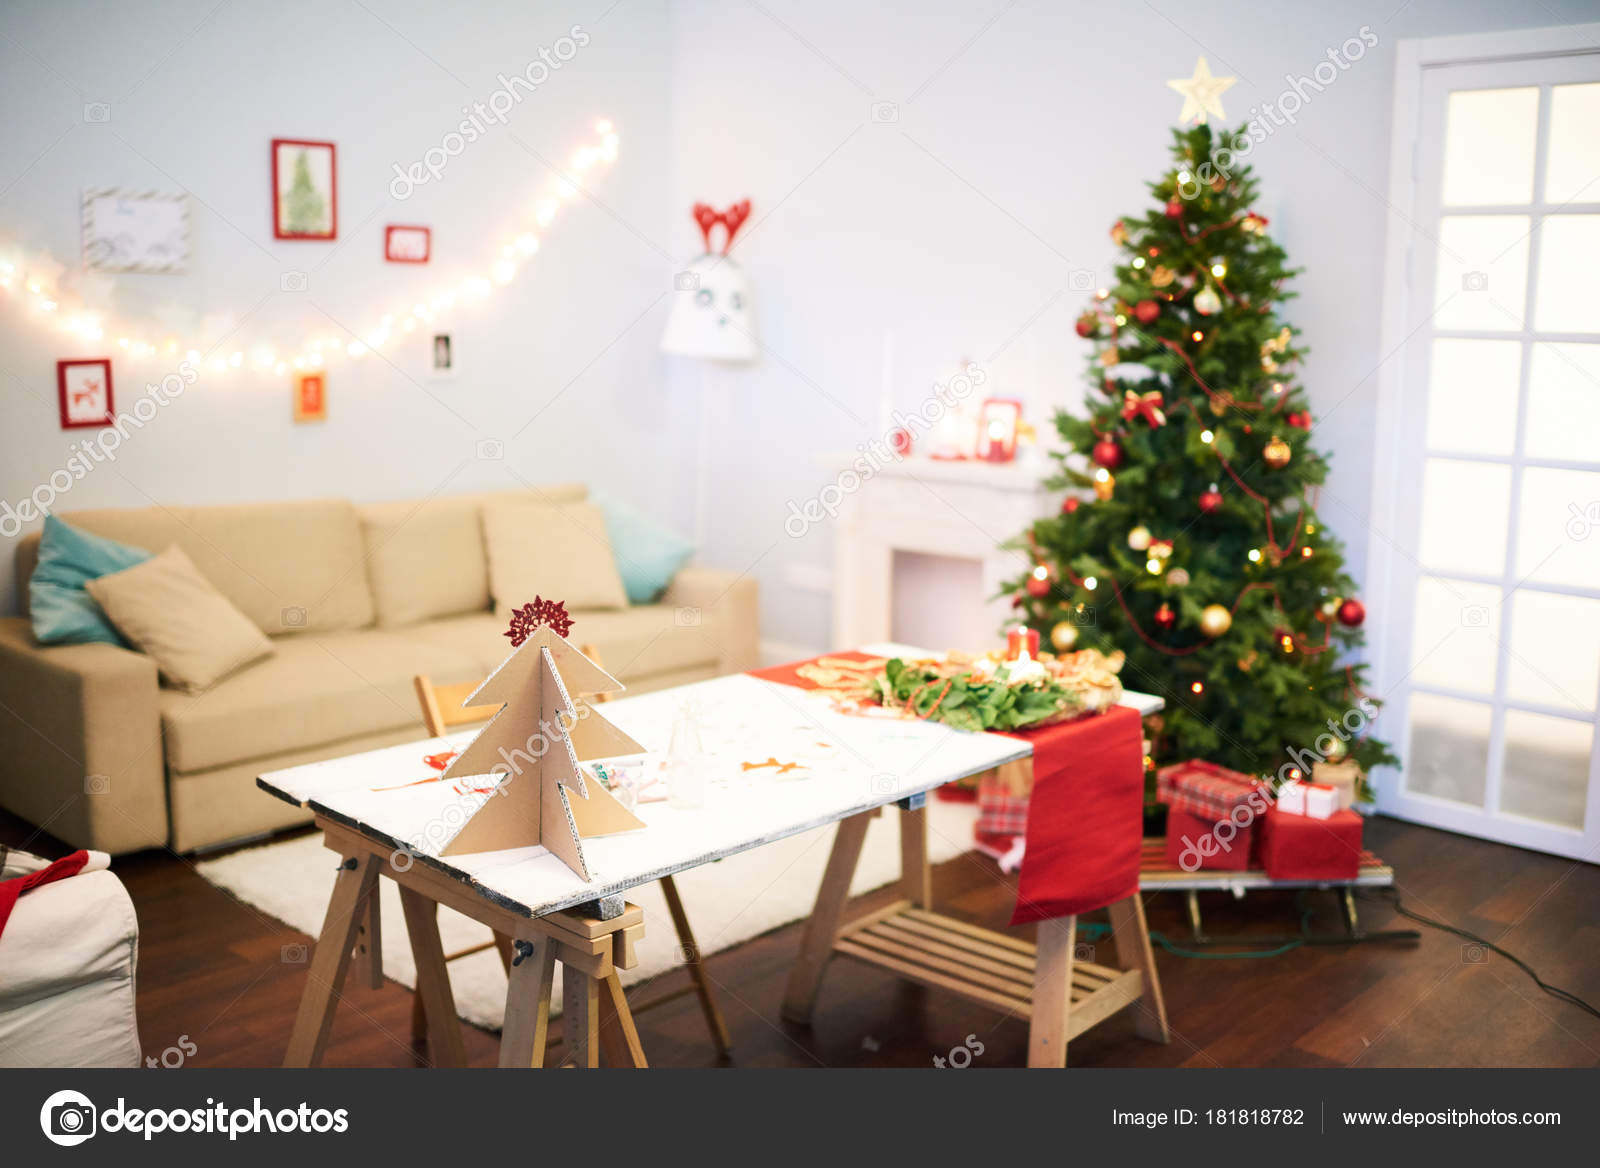 Preparations Christmas Celebration Cozy Living Room Festive